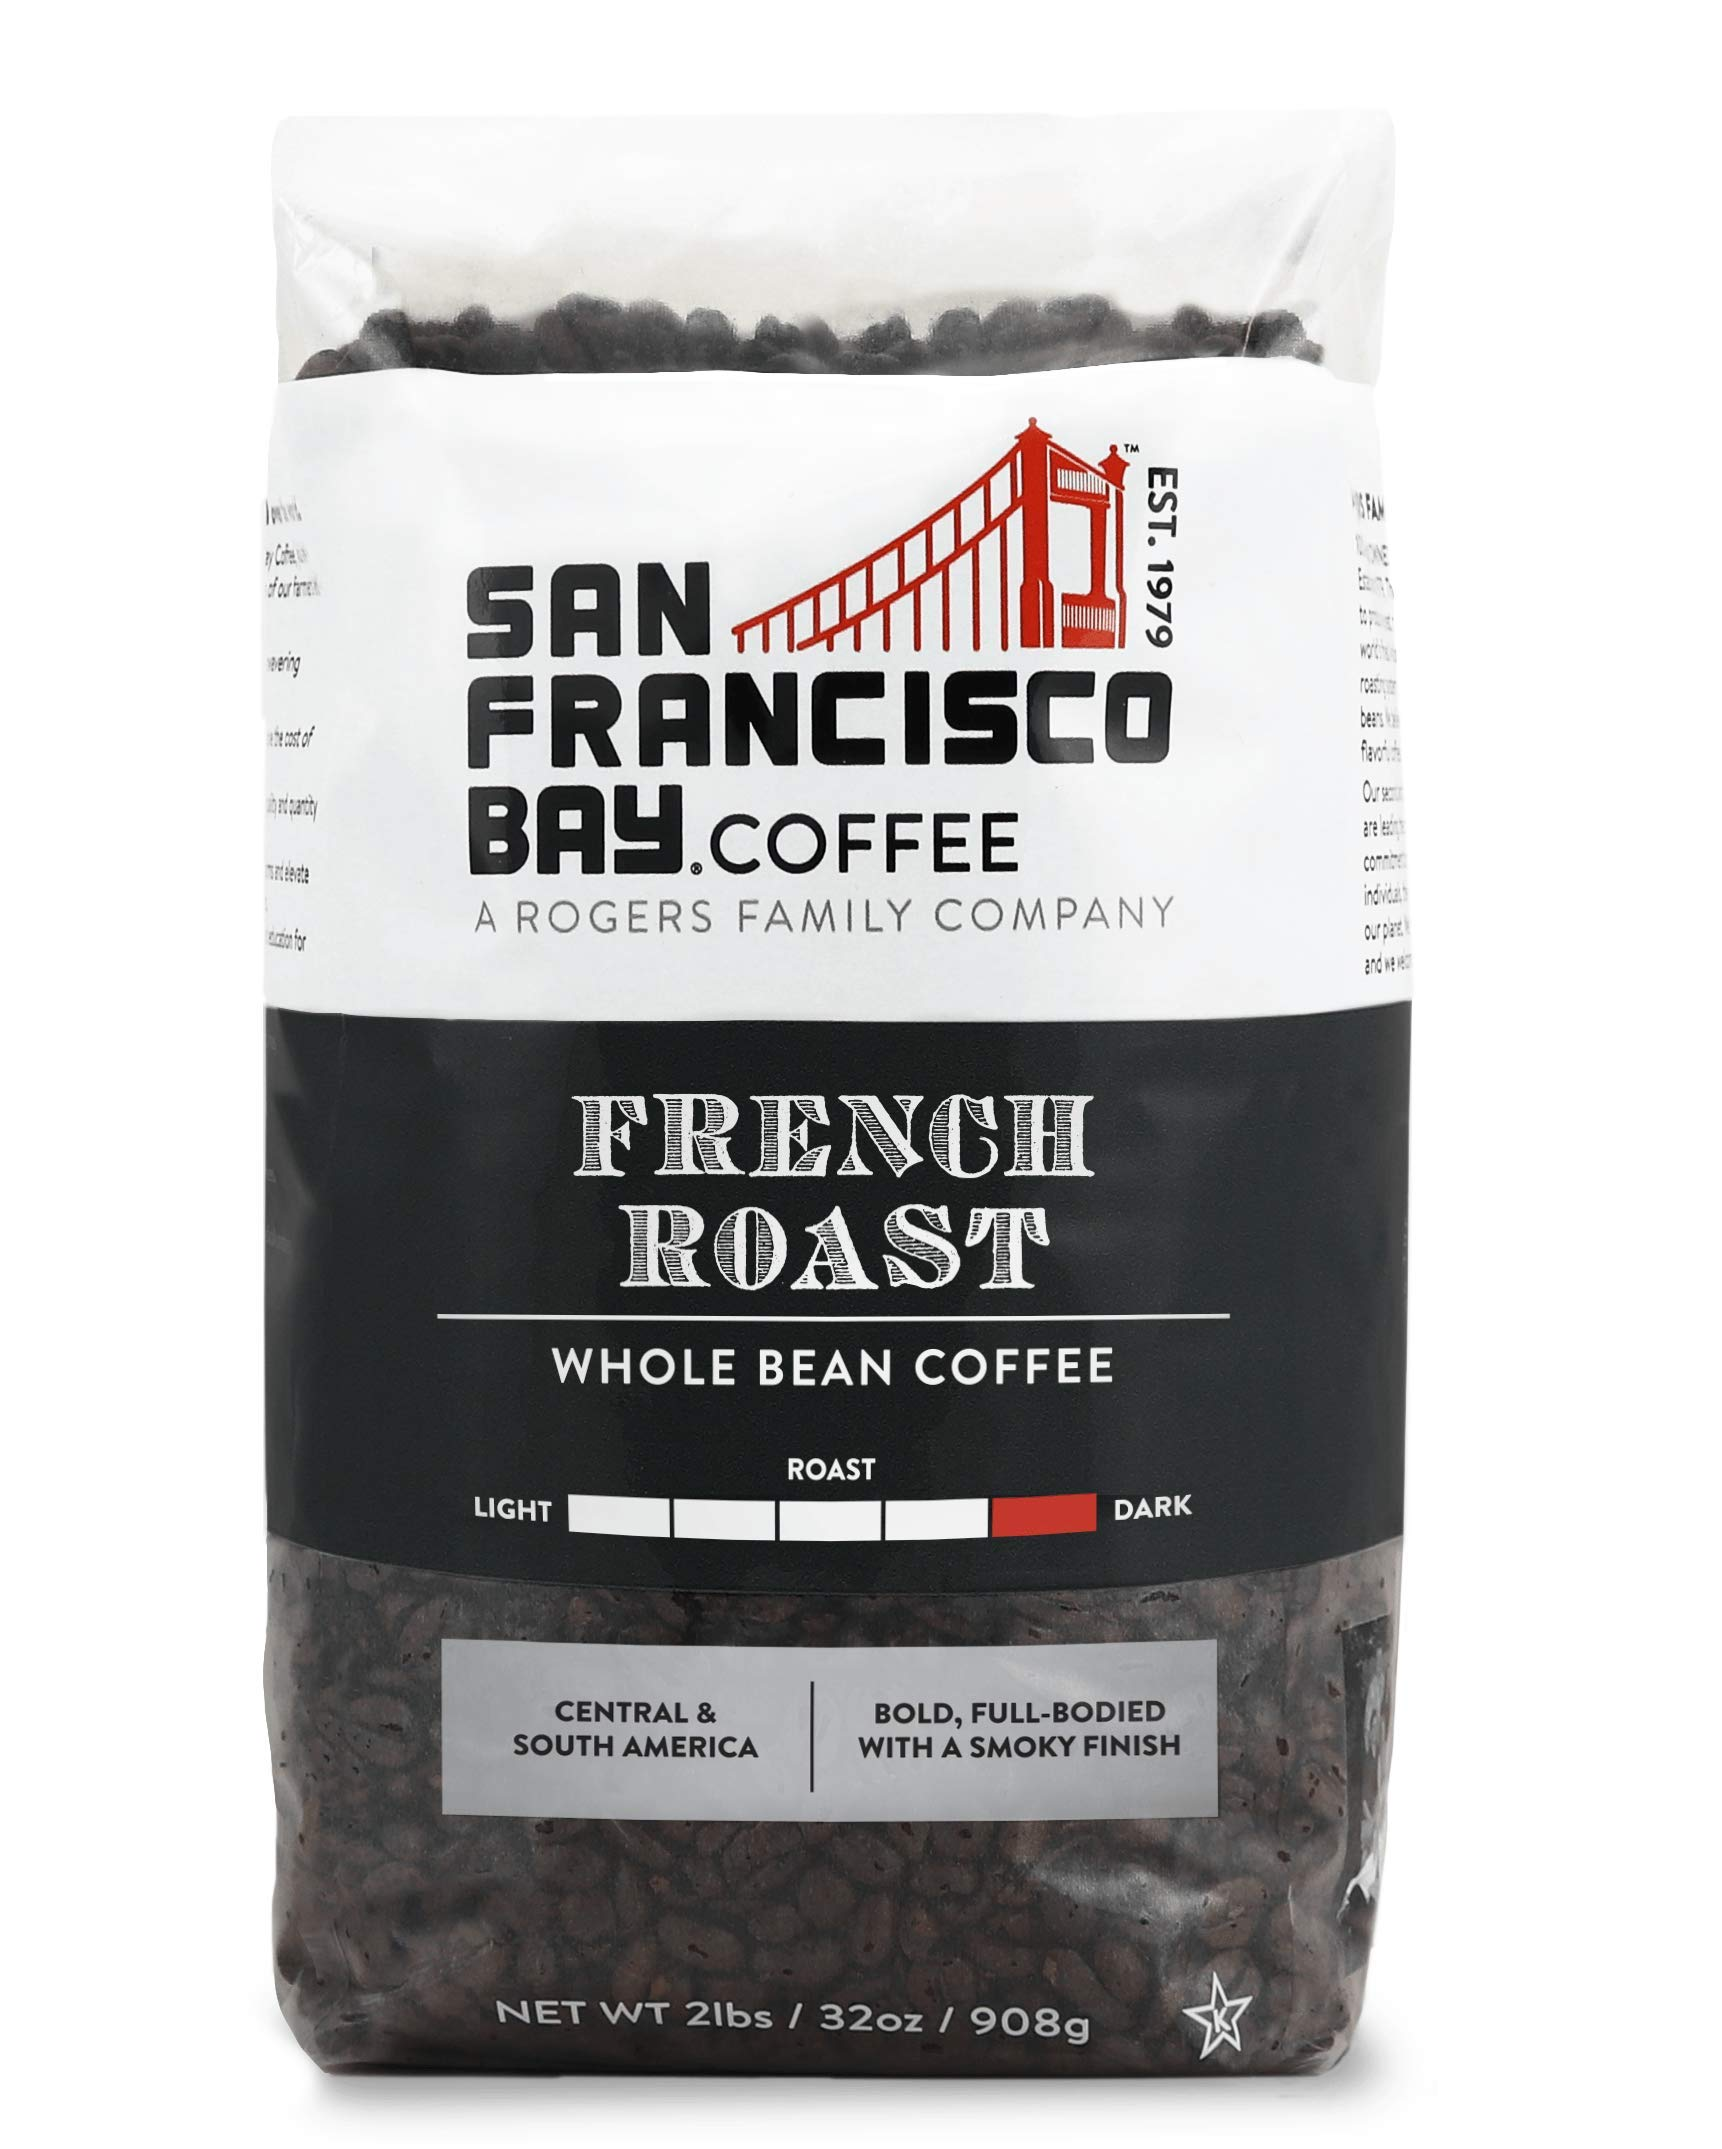 San Francisco Bay Coffee French Roast, Whole Bean, 908g